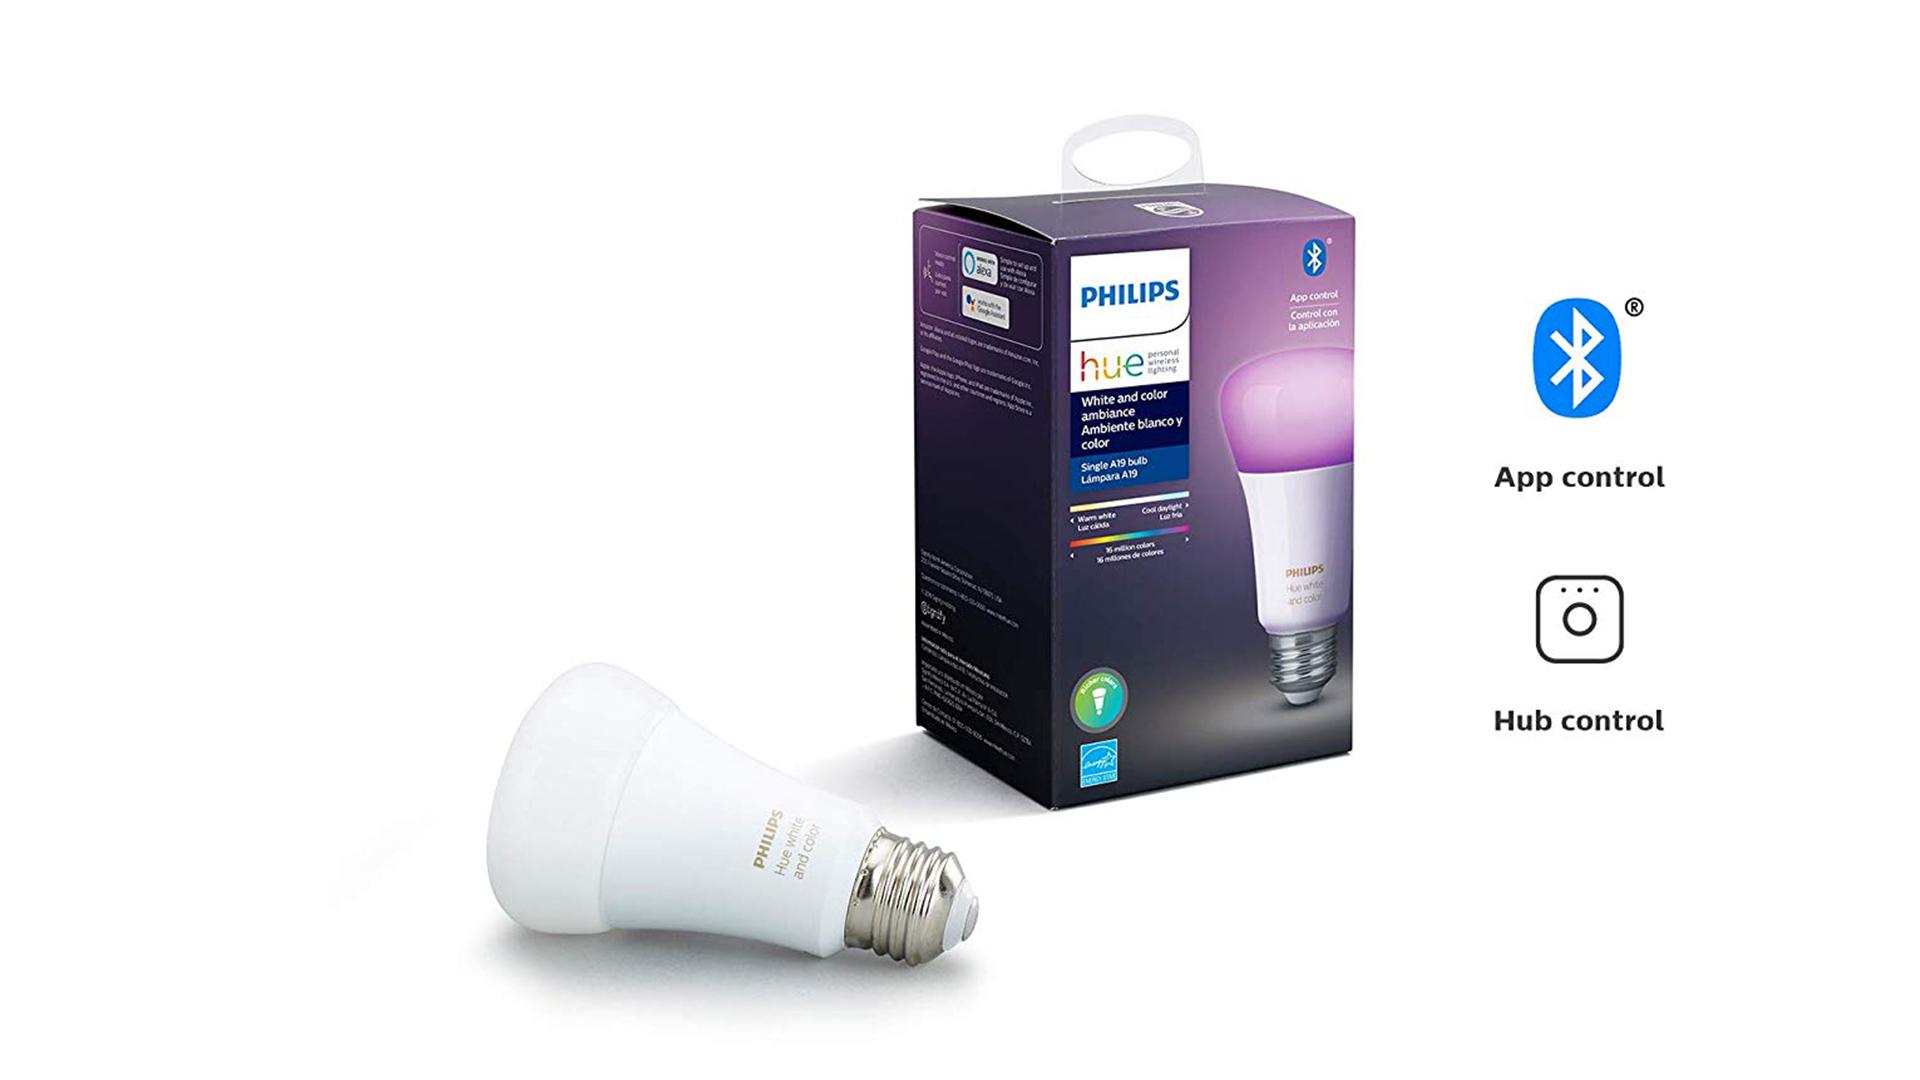 Philips Hue Hubless Bulbs